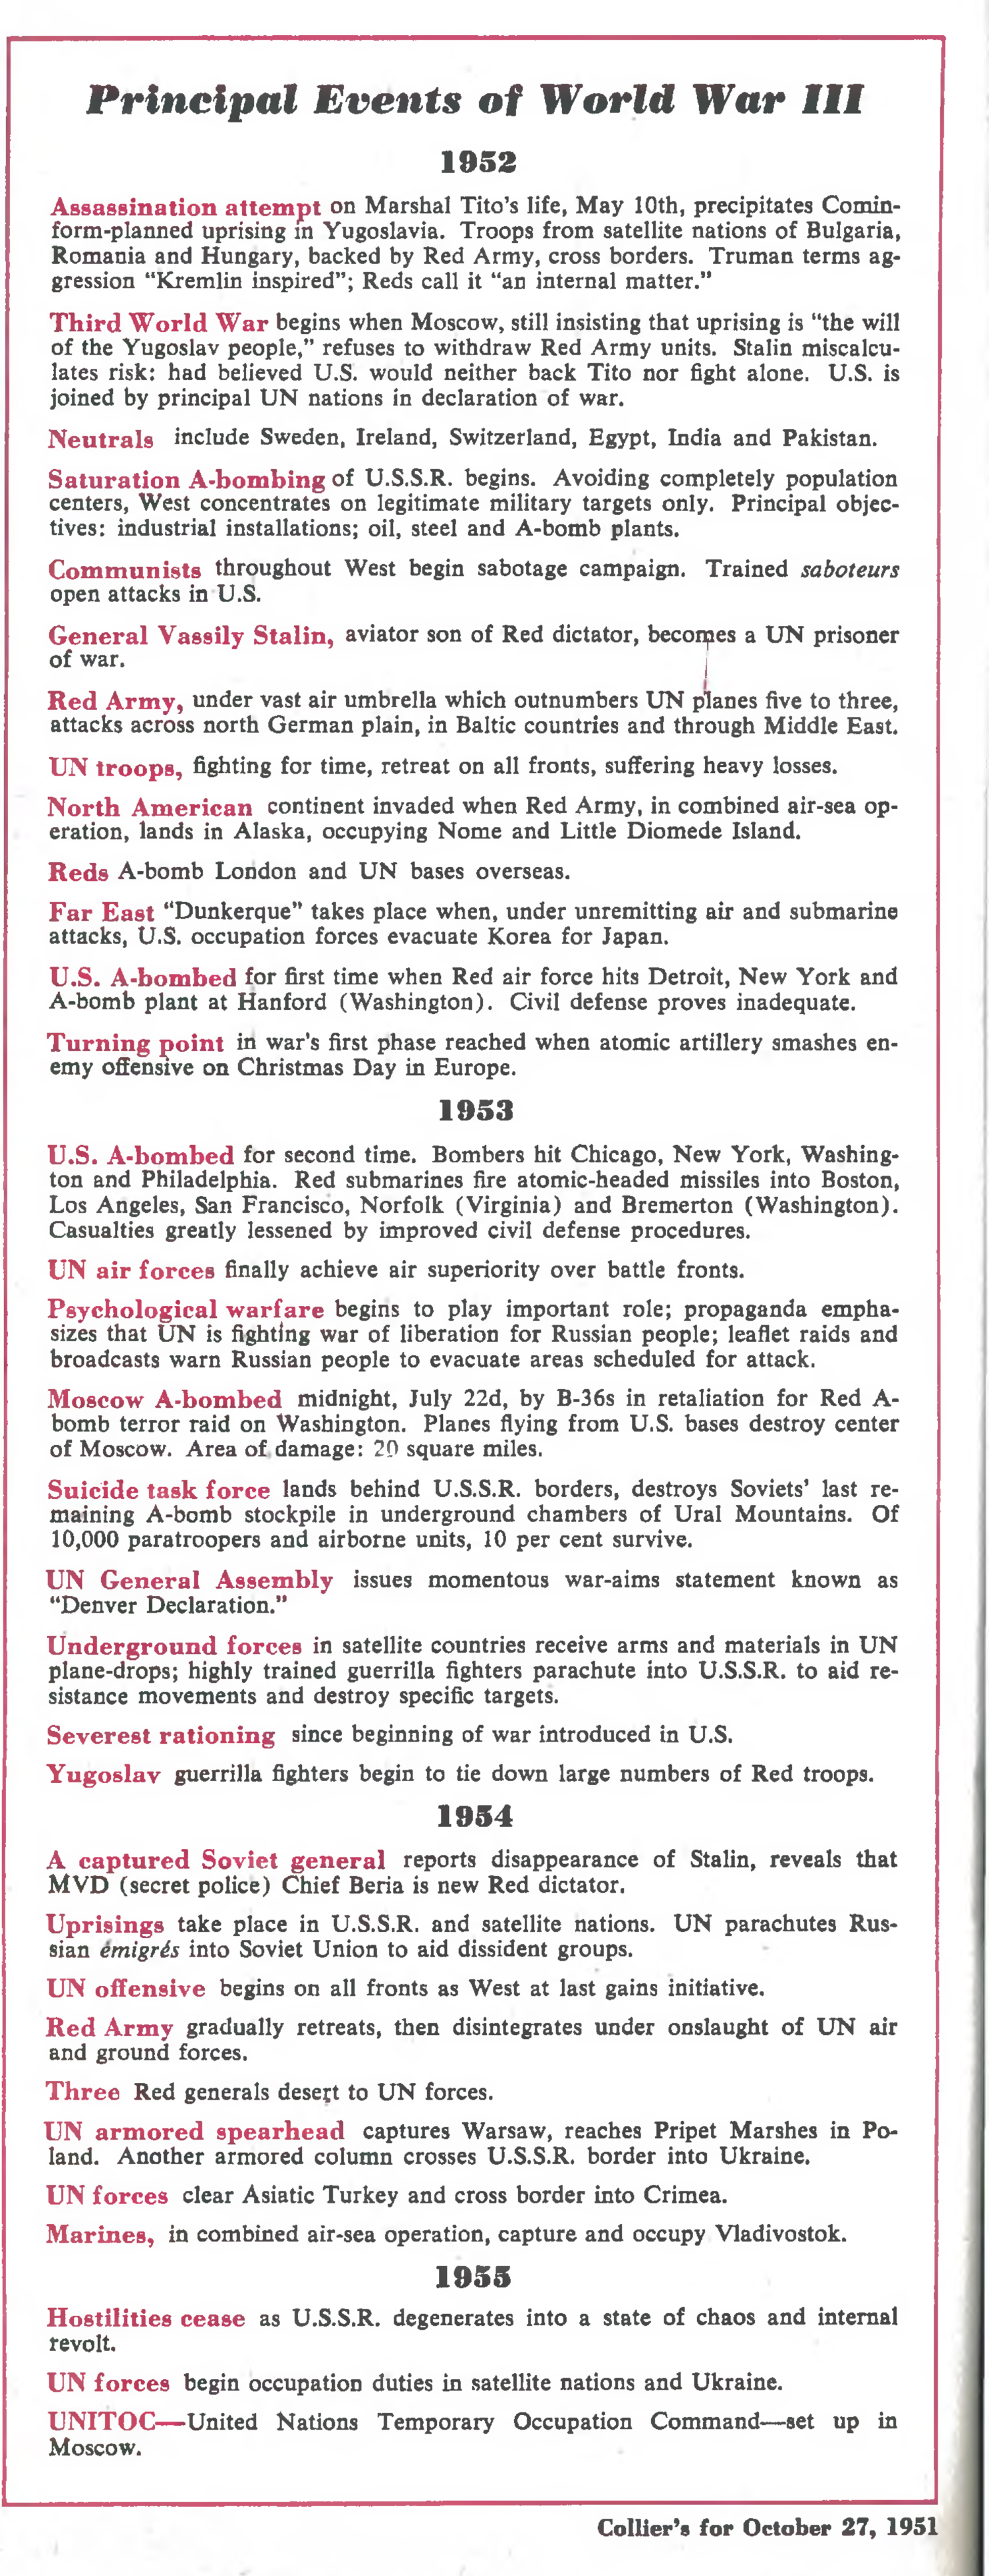 Collier's Weekly, 27 October 1951-14.jpg